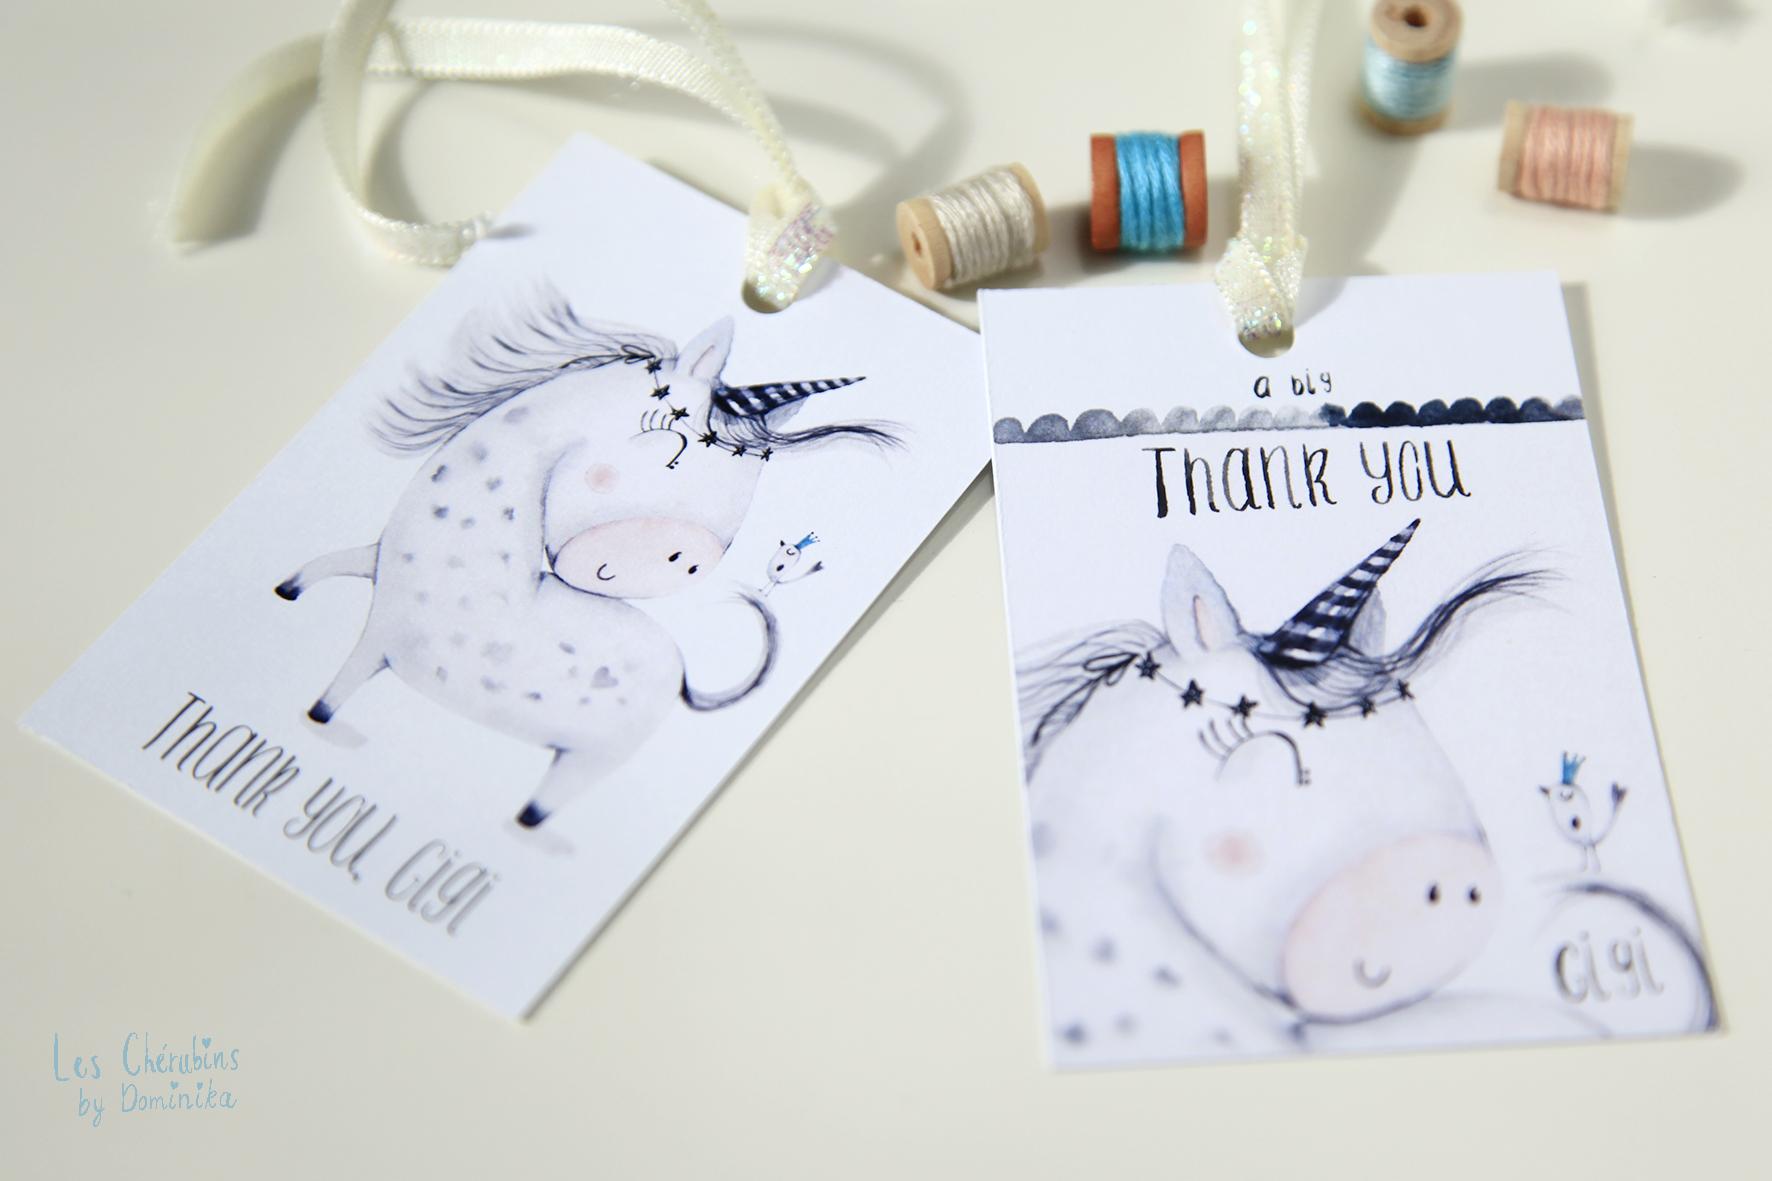 unicorn_watercolors_tkank_you_cards.JPG